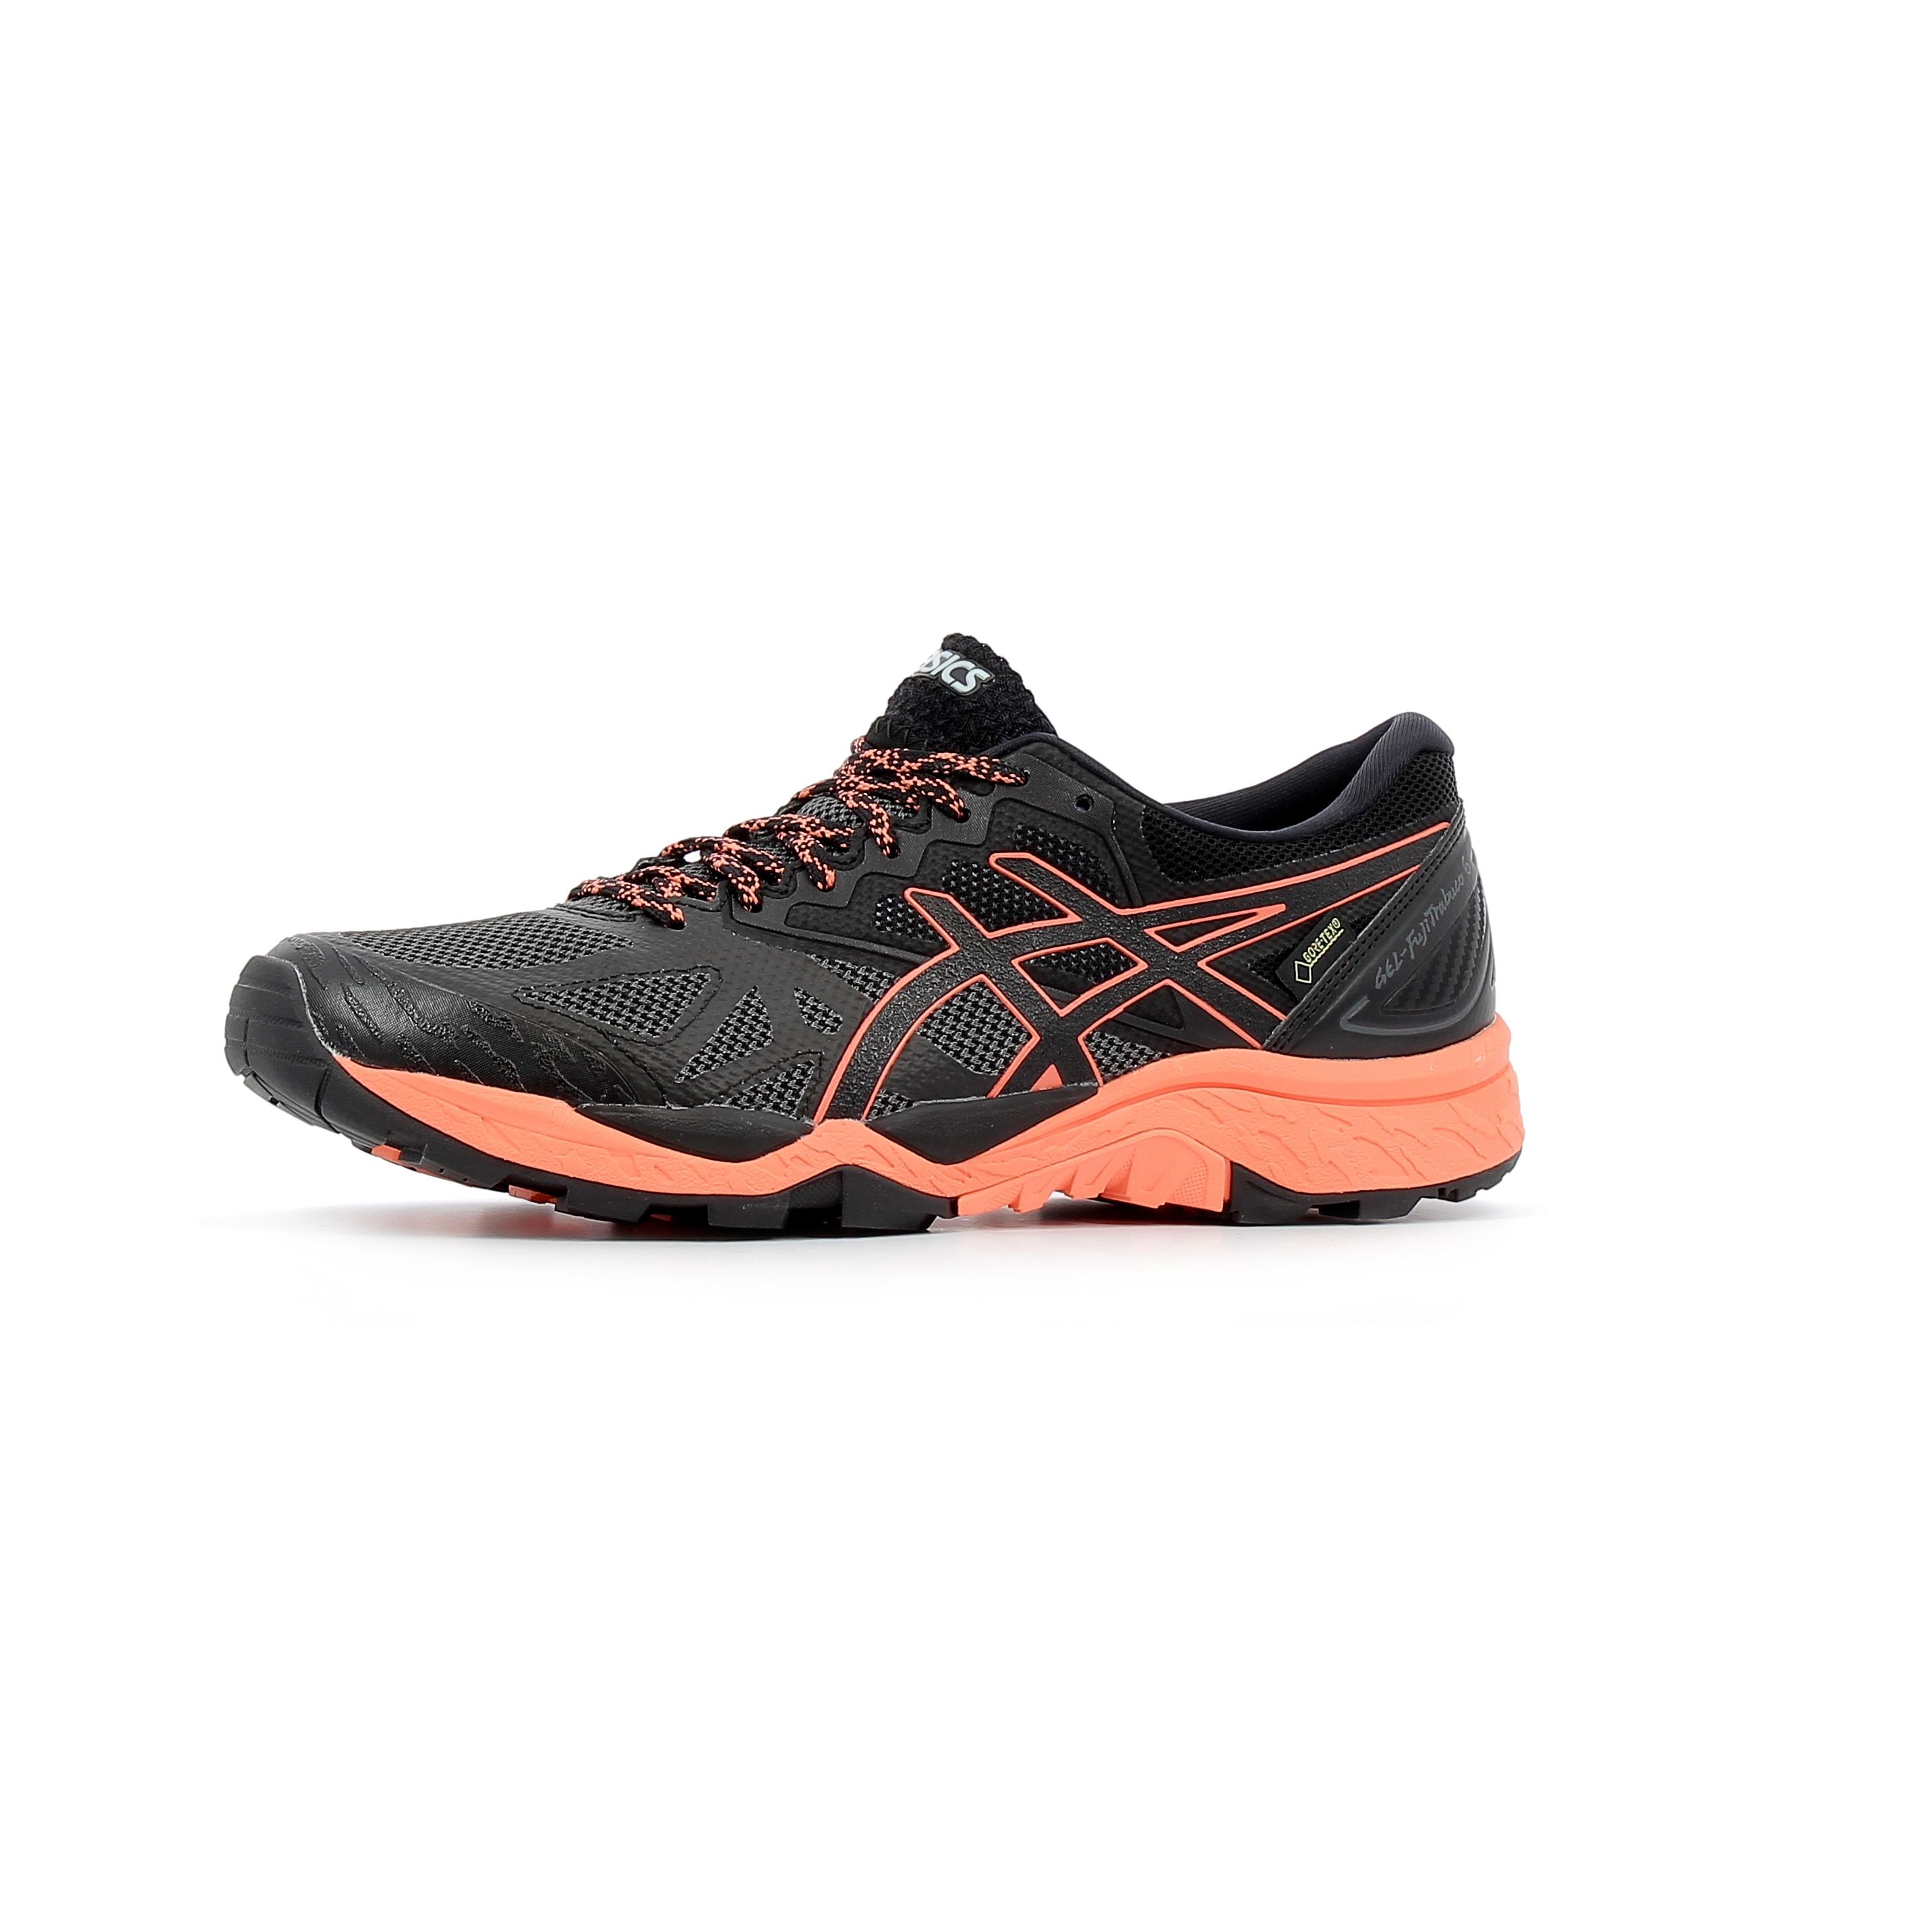 Trail Asics Fujitrabuco 6 Women De Chaussure Gel Gore Tex lK1JFc